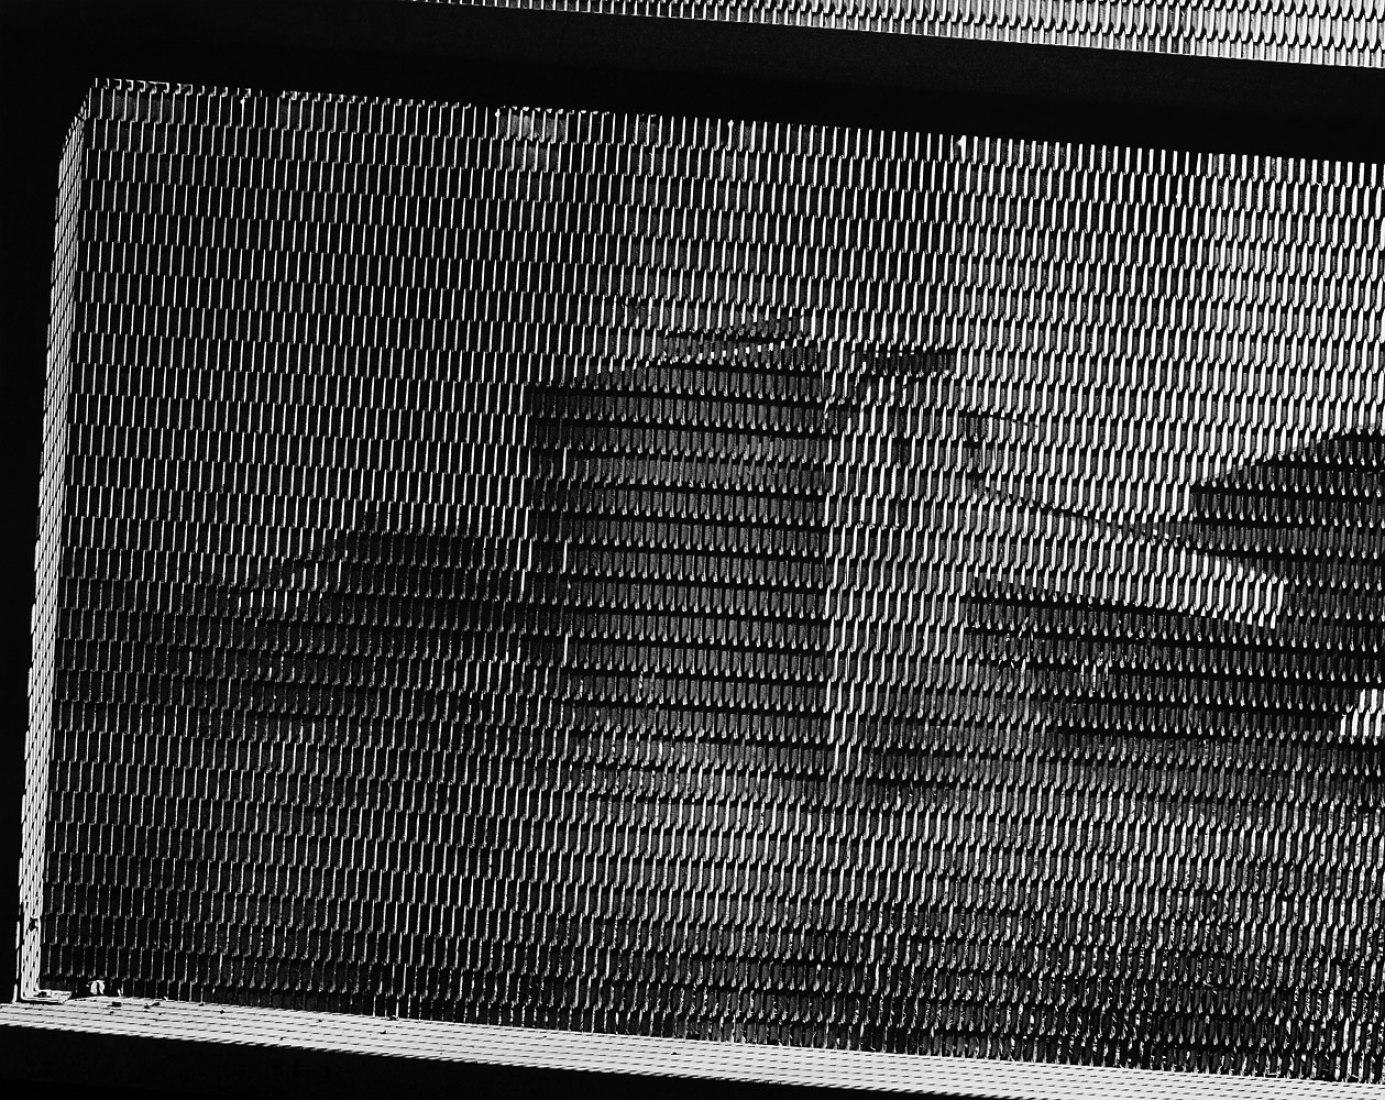 CSR Series, Port Waratah, From Conveyor Tower, 1981. Silver gelatin print, 29 x 33 in. Courtesy Rosamund Felsen Gallery. Photography © Grant Mudford.